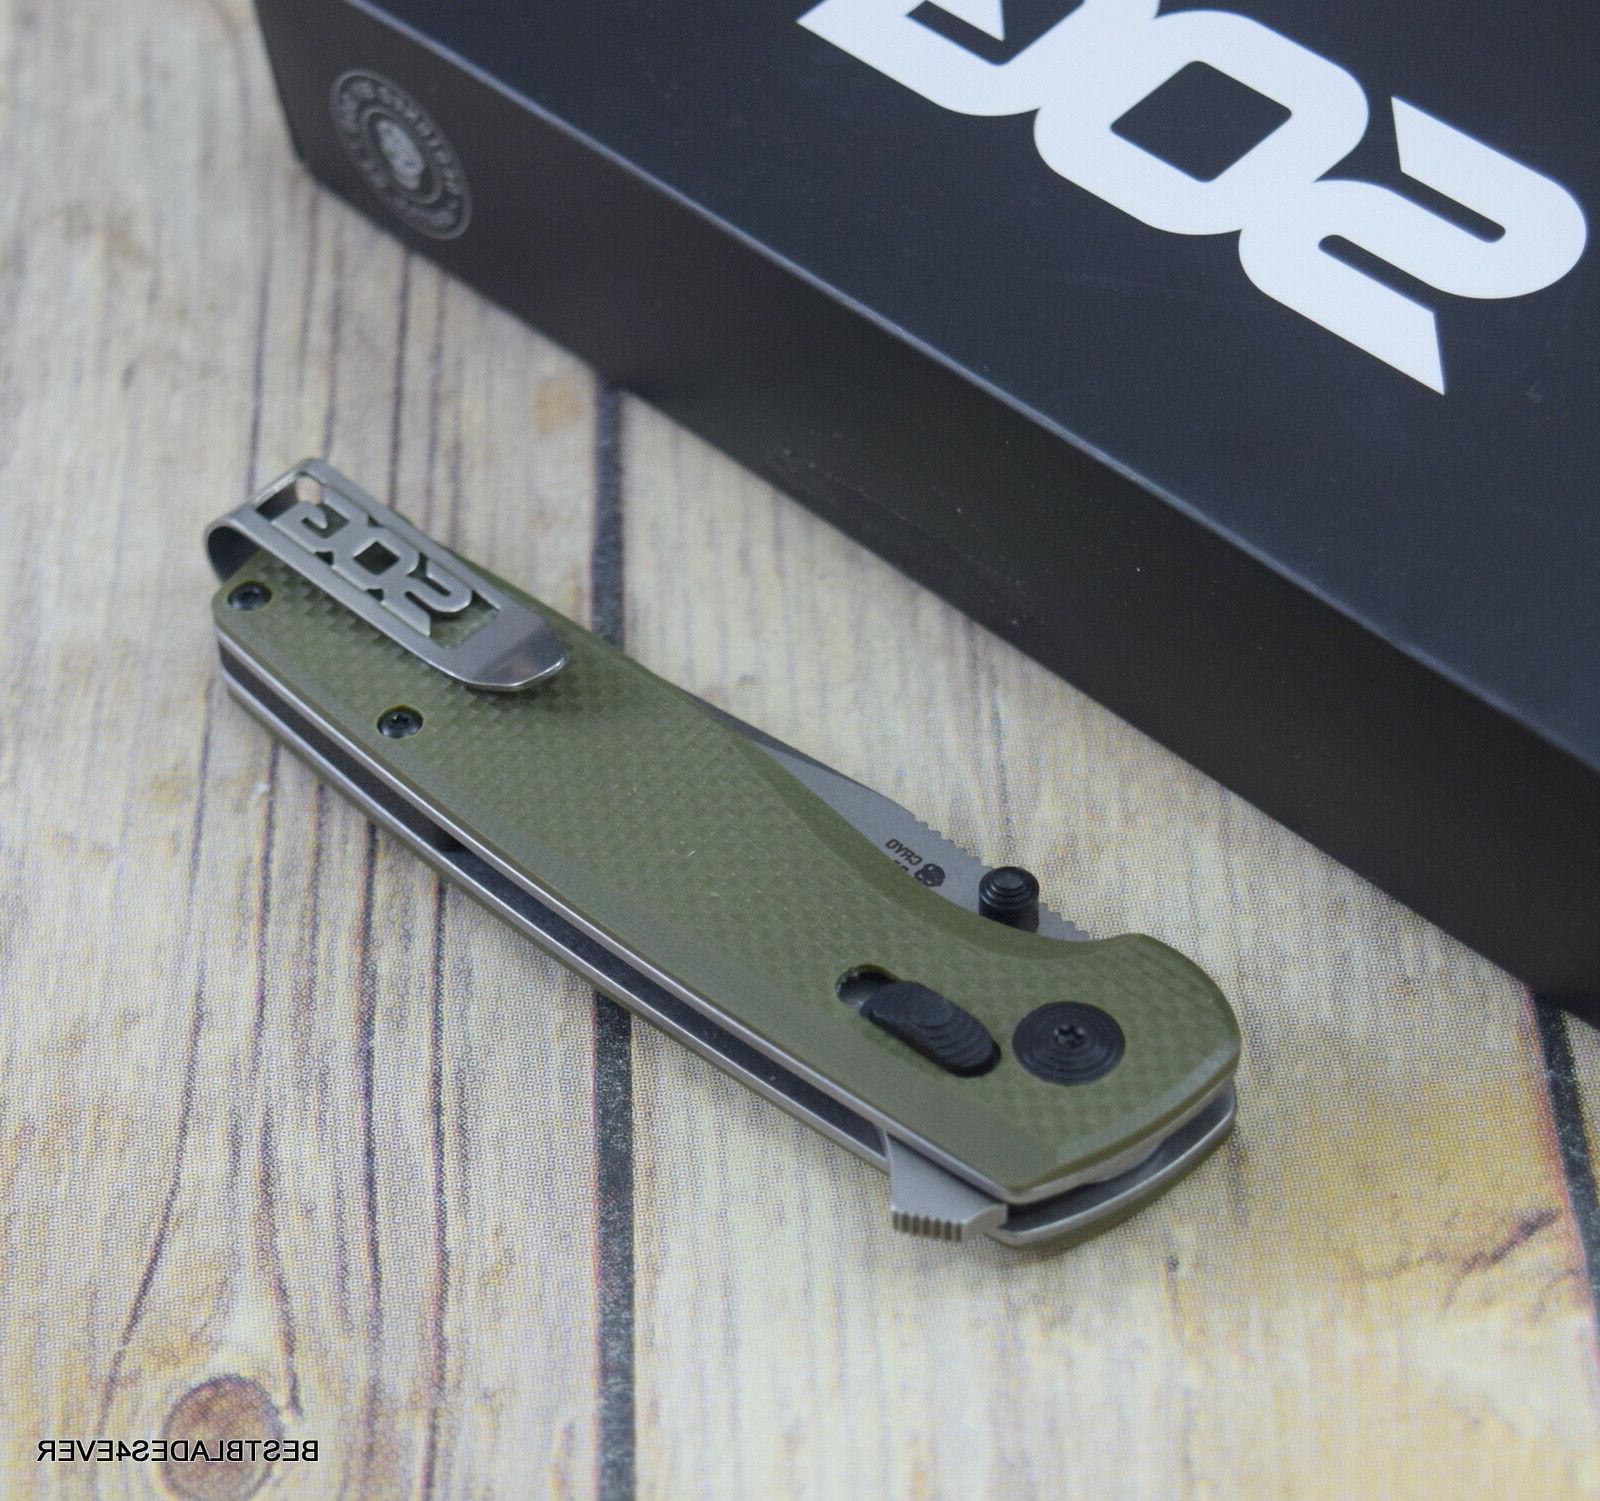 SOG GREEN G10 KNIFE POCKET SHARP